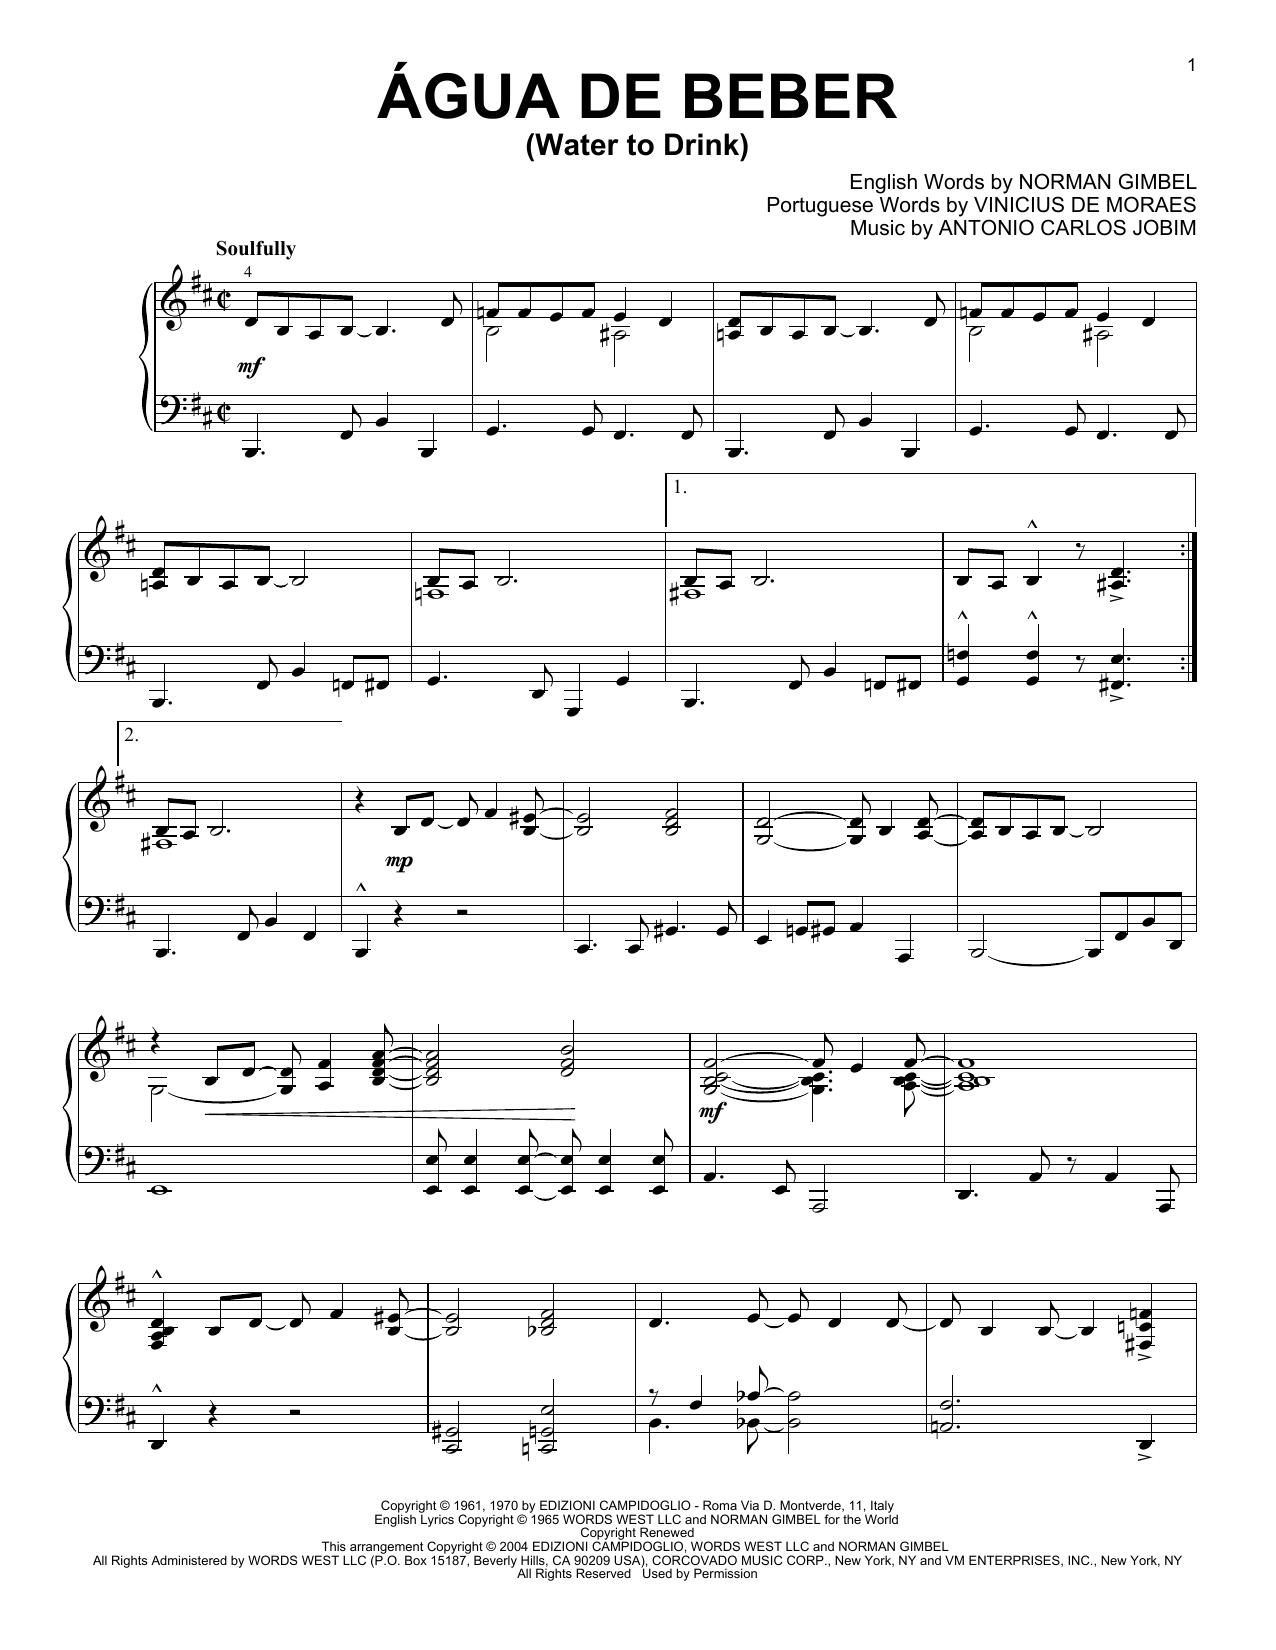 Antonio Carlos Jobim Agua De Beber (Water To Drink) sheet music notes and chords. Download Printable PDF.